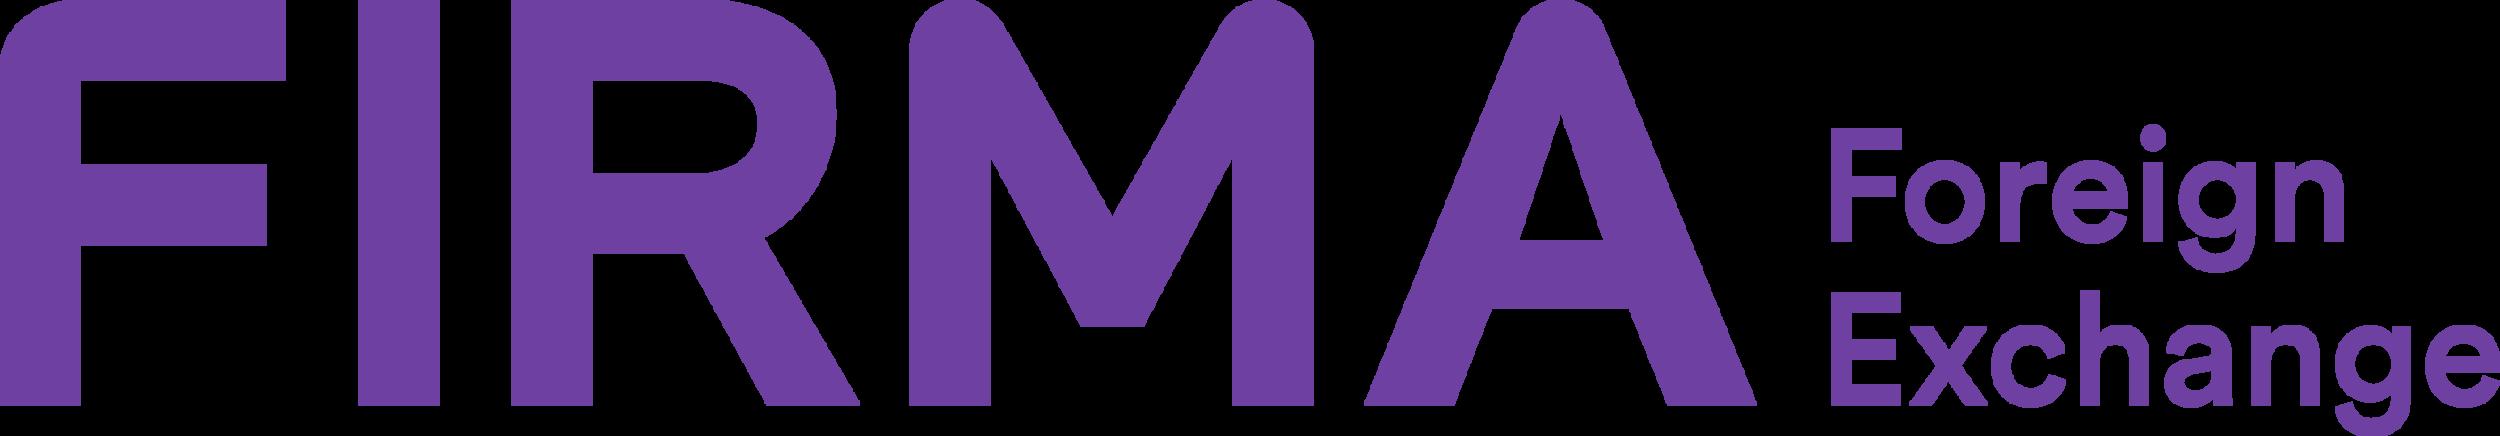 Firma_Wordmark_Purple (002).png